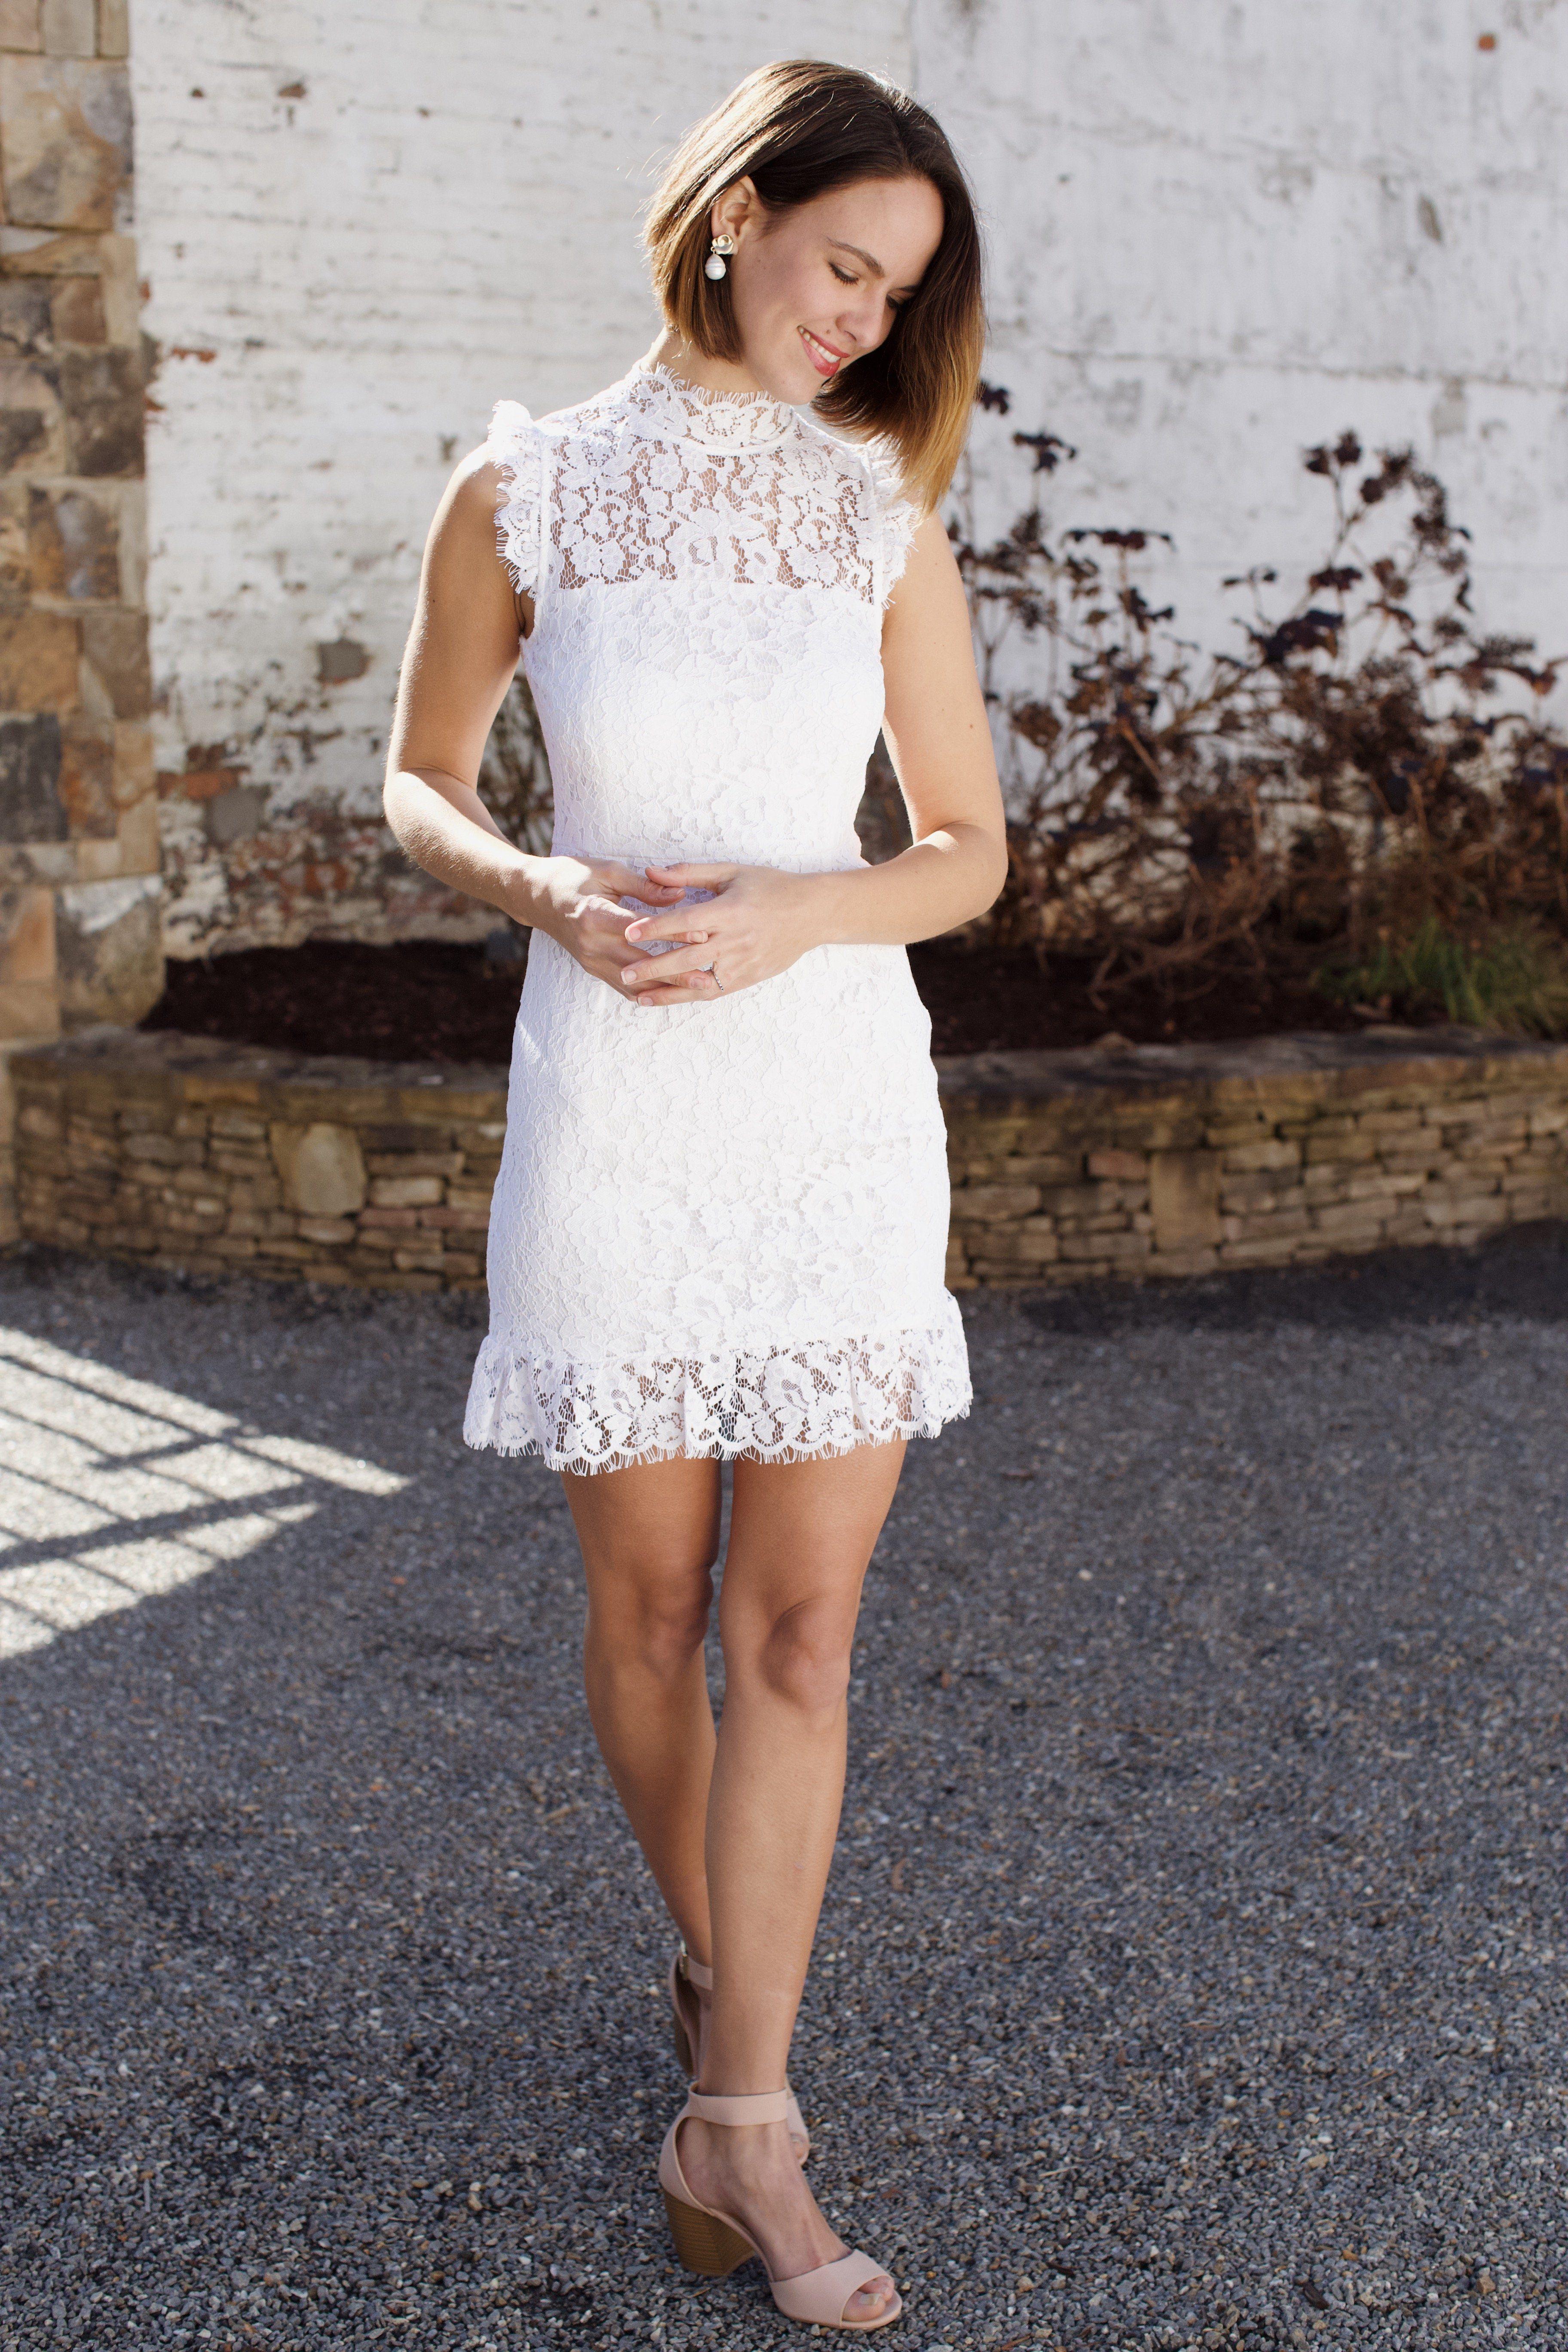 Hannah Lace High Neck Dress Women S White Formal Dresses North Main Clothing Company White Short Dress White Dresses Graduation Courthouse Wedding Dress [ 5472 x 3648 Pixel ]